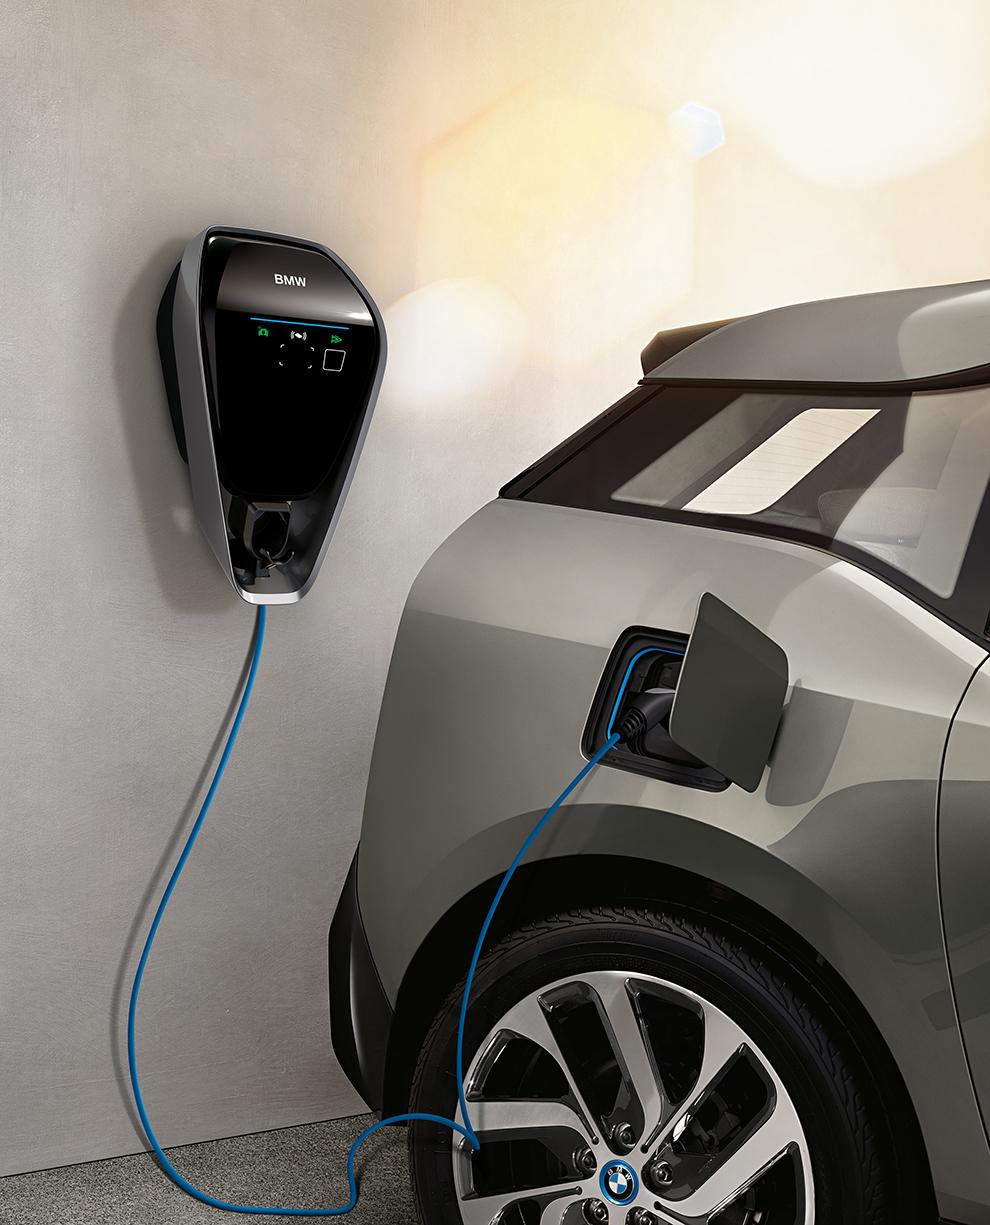 BMW no creará una red de cargadores propia, como Tesla o Porsche.